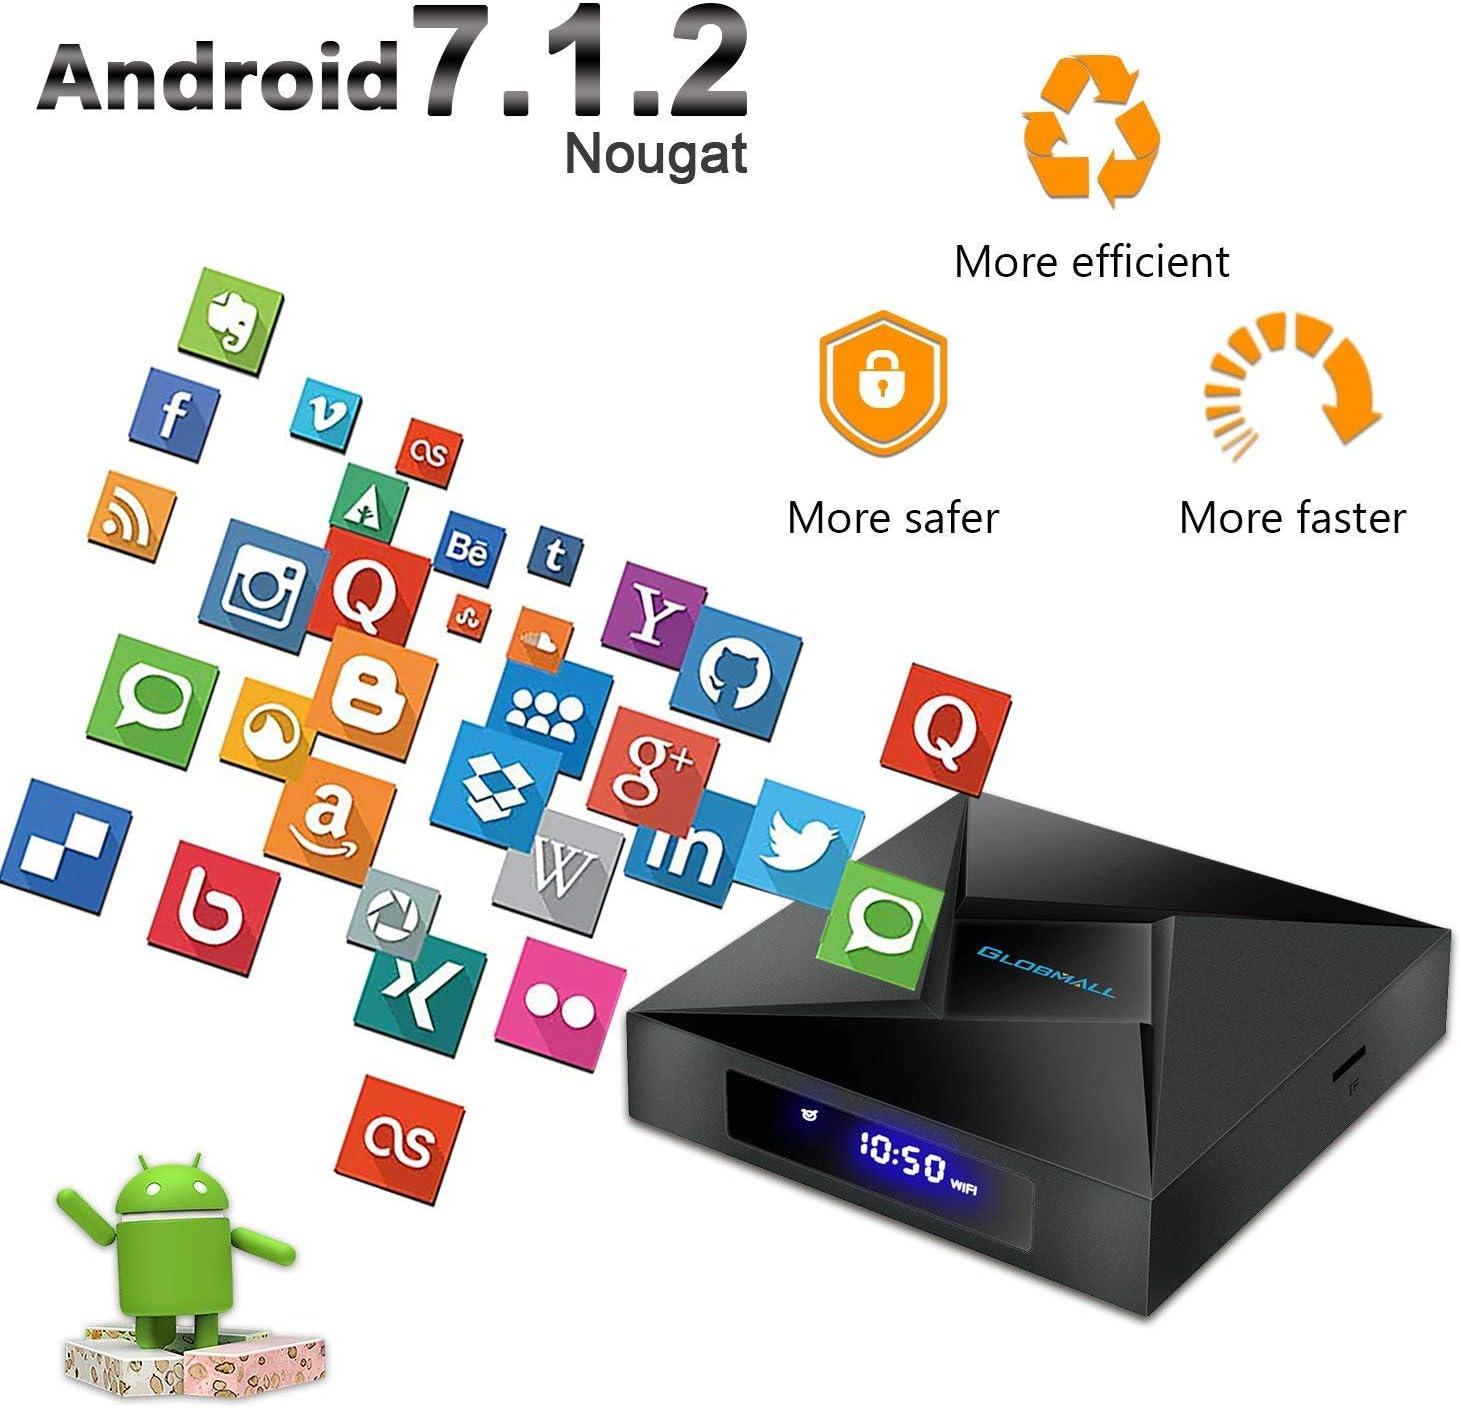 2017 Model glob Mall Android 6.0 Marshmallow Device T95 X Android TV Box Amlogic 64 bits y True 4 K Jugar: Amazon.es: Electrónica